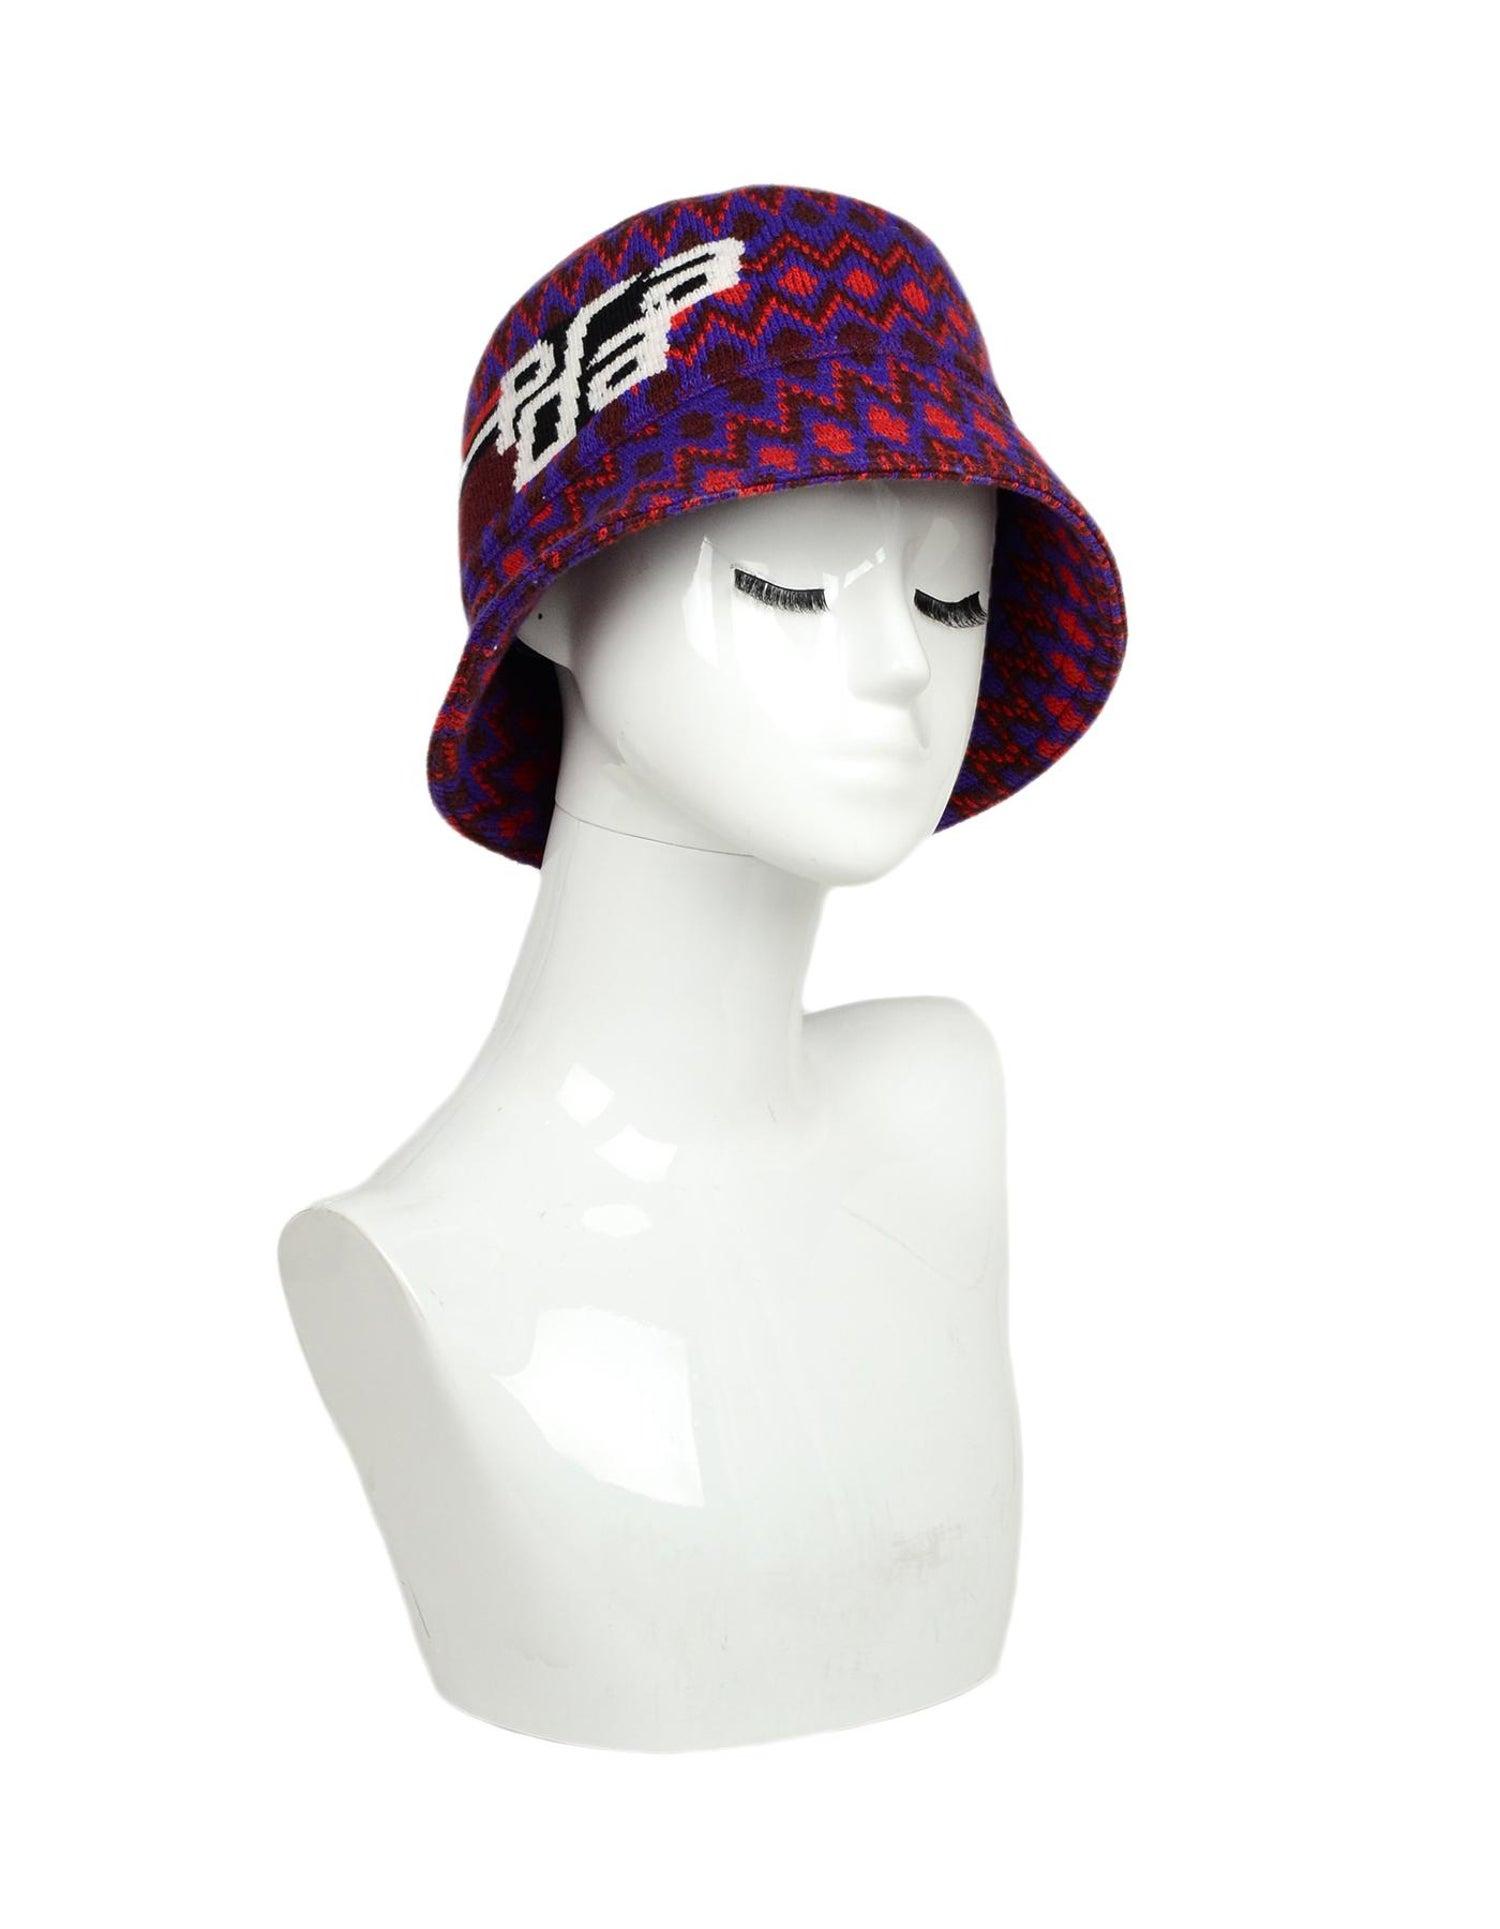 6b456c73fbf25 Prada Red Purple Cashmere Wool Chevron Motif Bucket Hat Sz M For Sale at  1stdibs